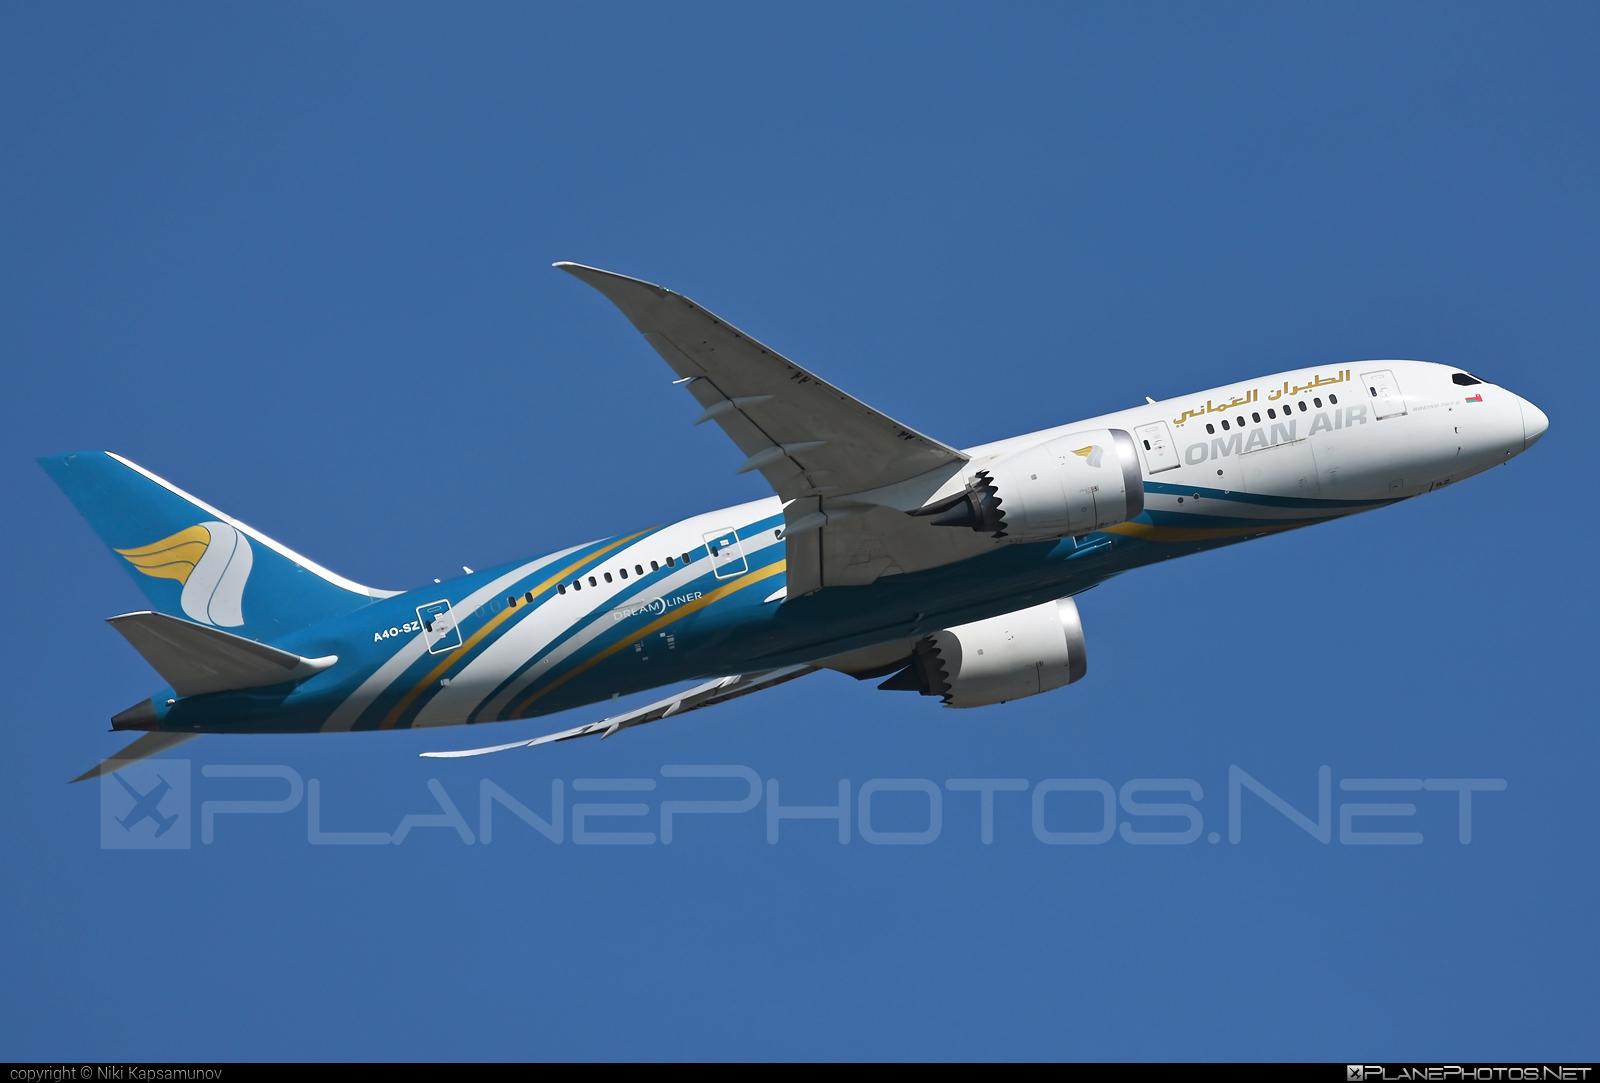 Oman Air Boeing 787-8 Dreamliner - A4O-SZ #b787 #boeing #boeing787 #dreamliner